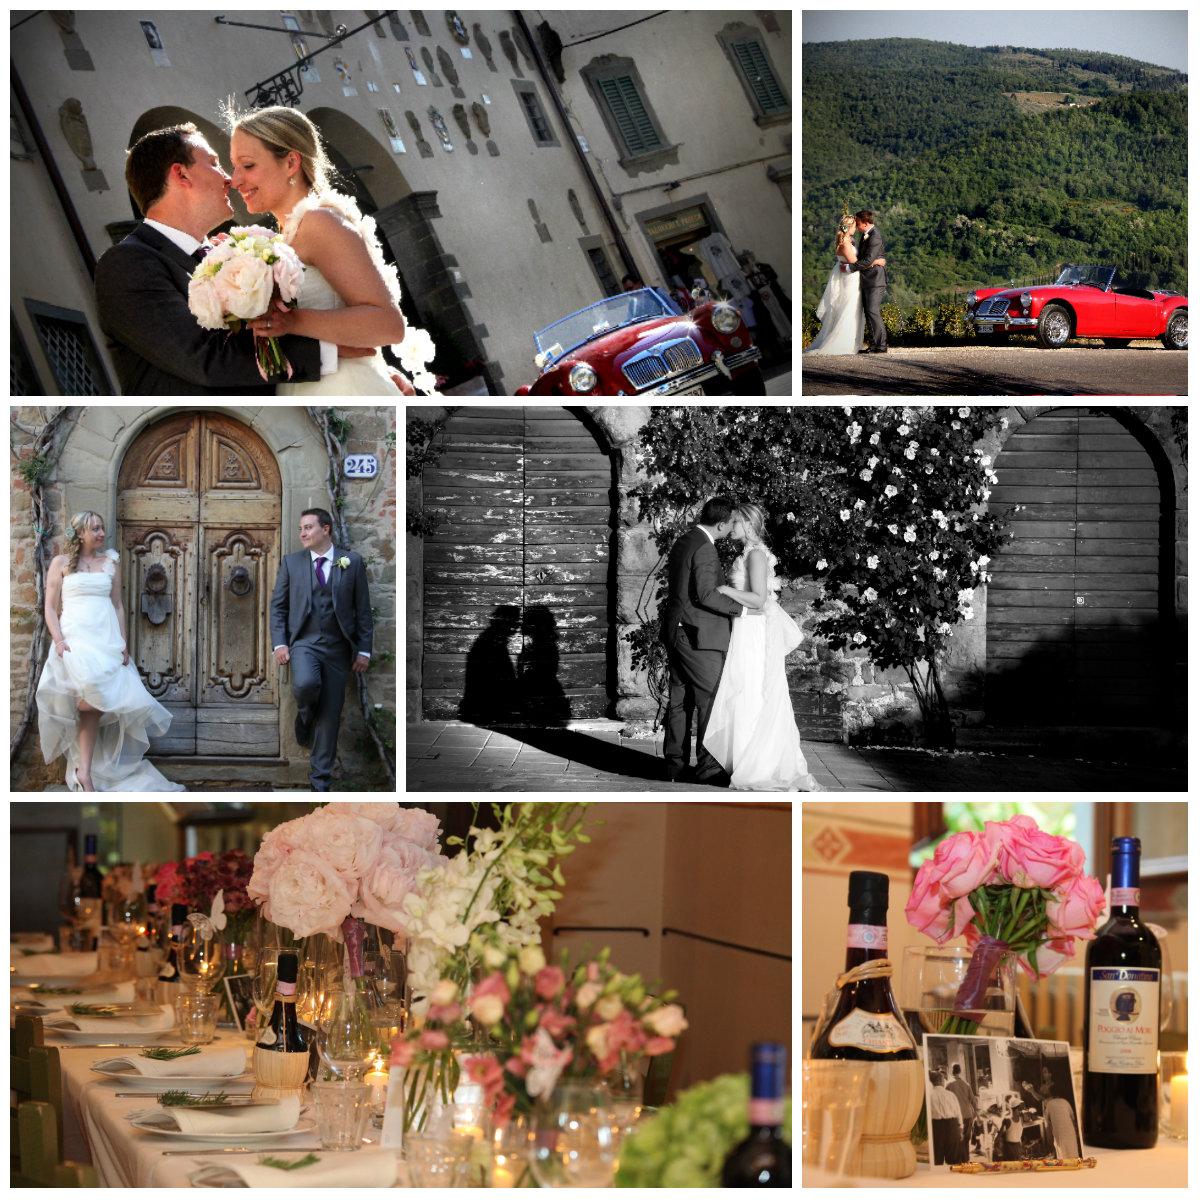 Chianti Classico wedding